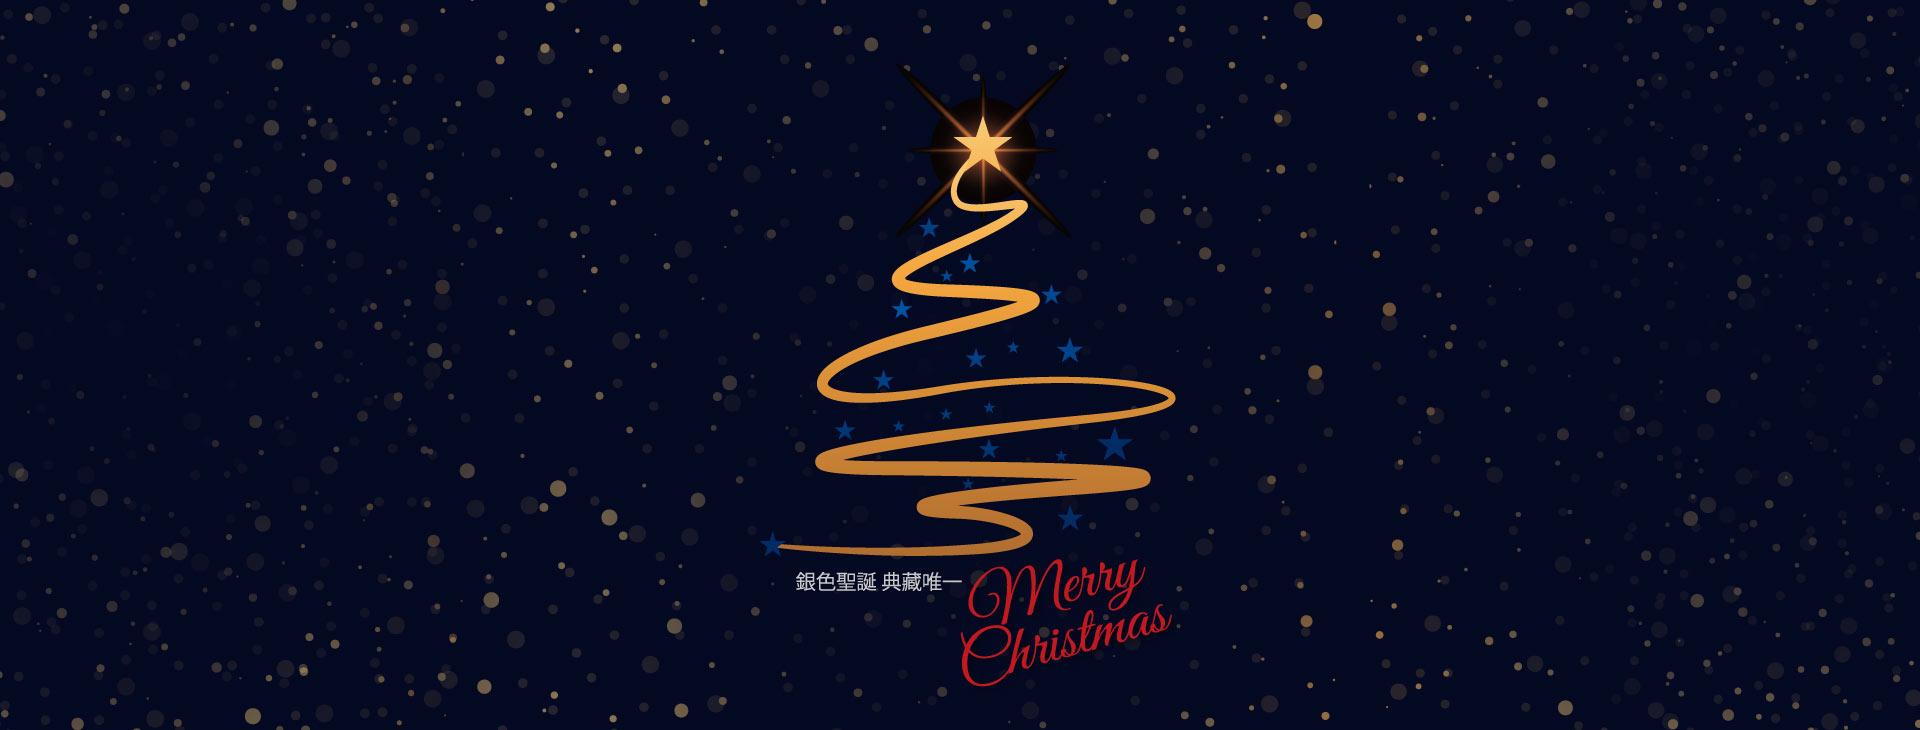 Merry Christmas銀色聖誕 典藏唯一